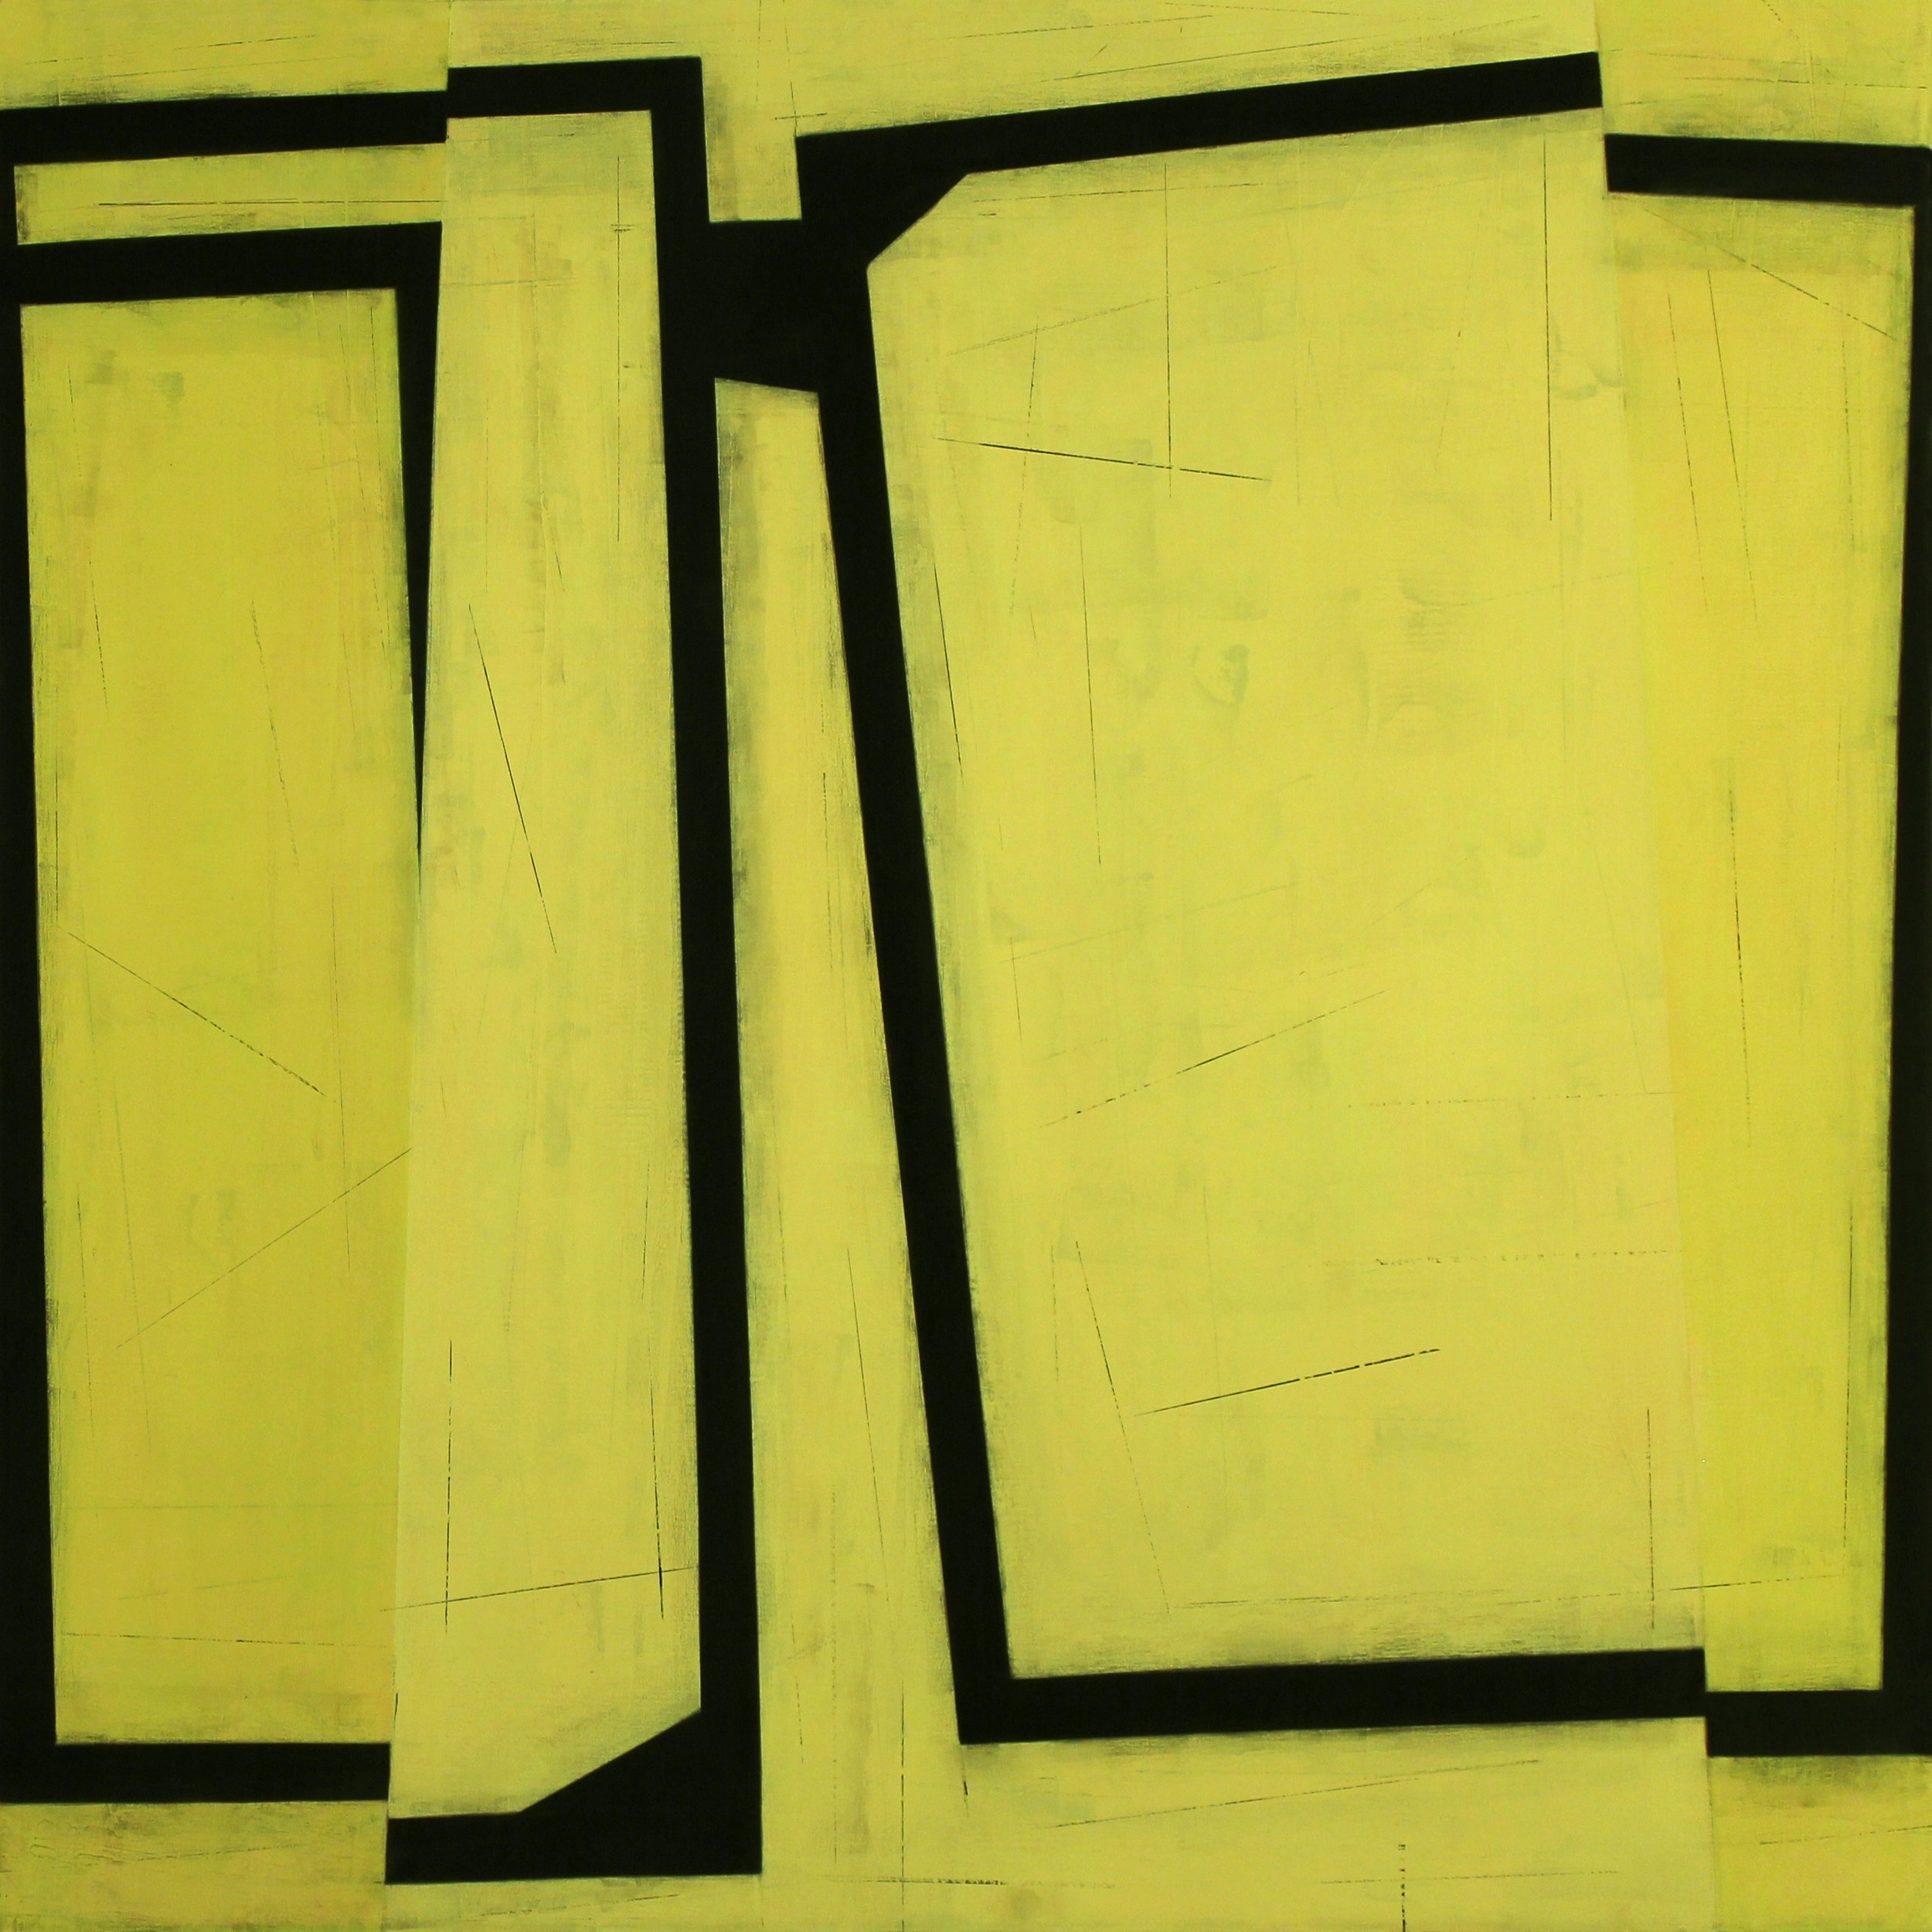 Jump Cut E1  |  2018  |  oil on canvas  |  50 x 50 inches